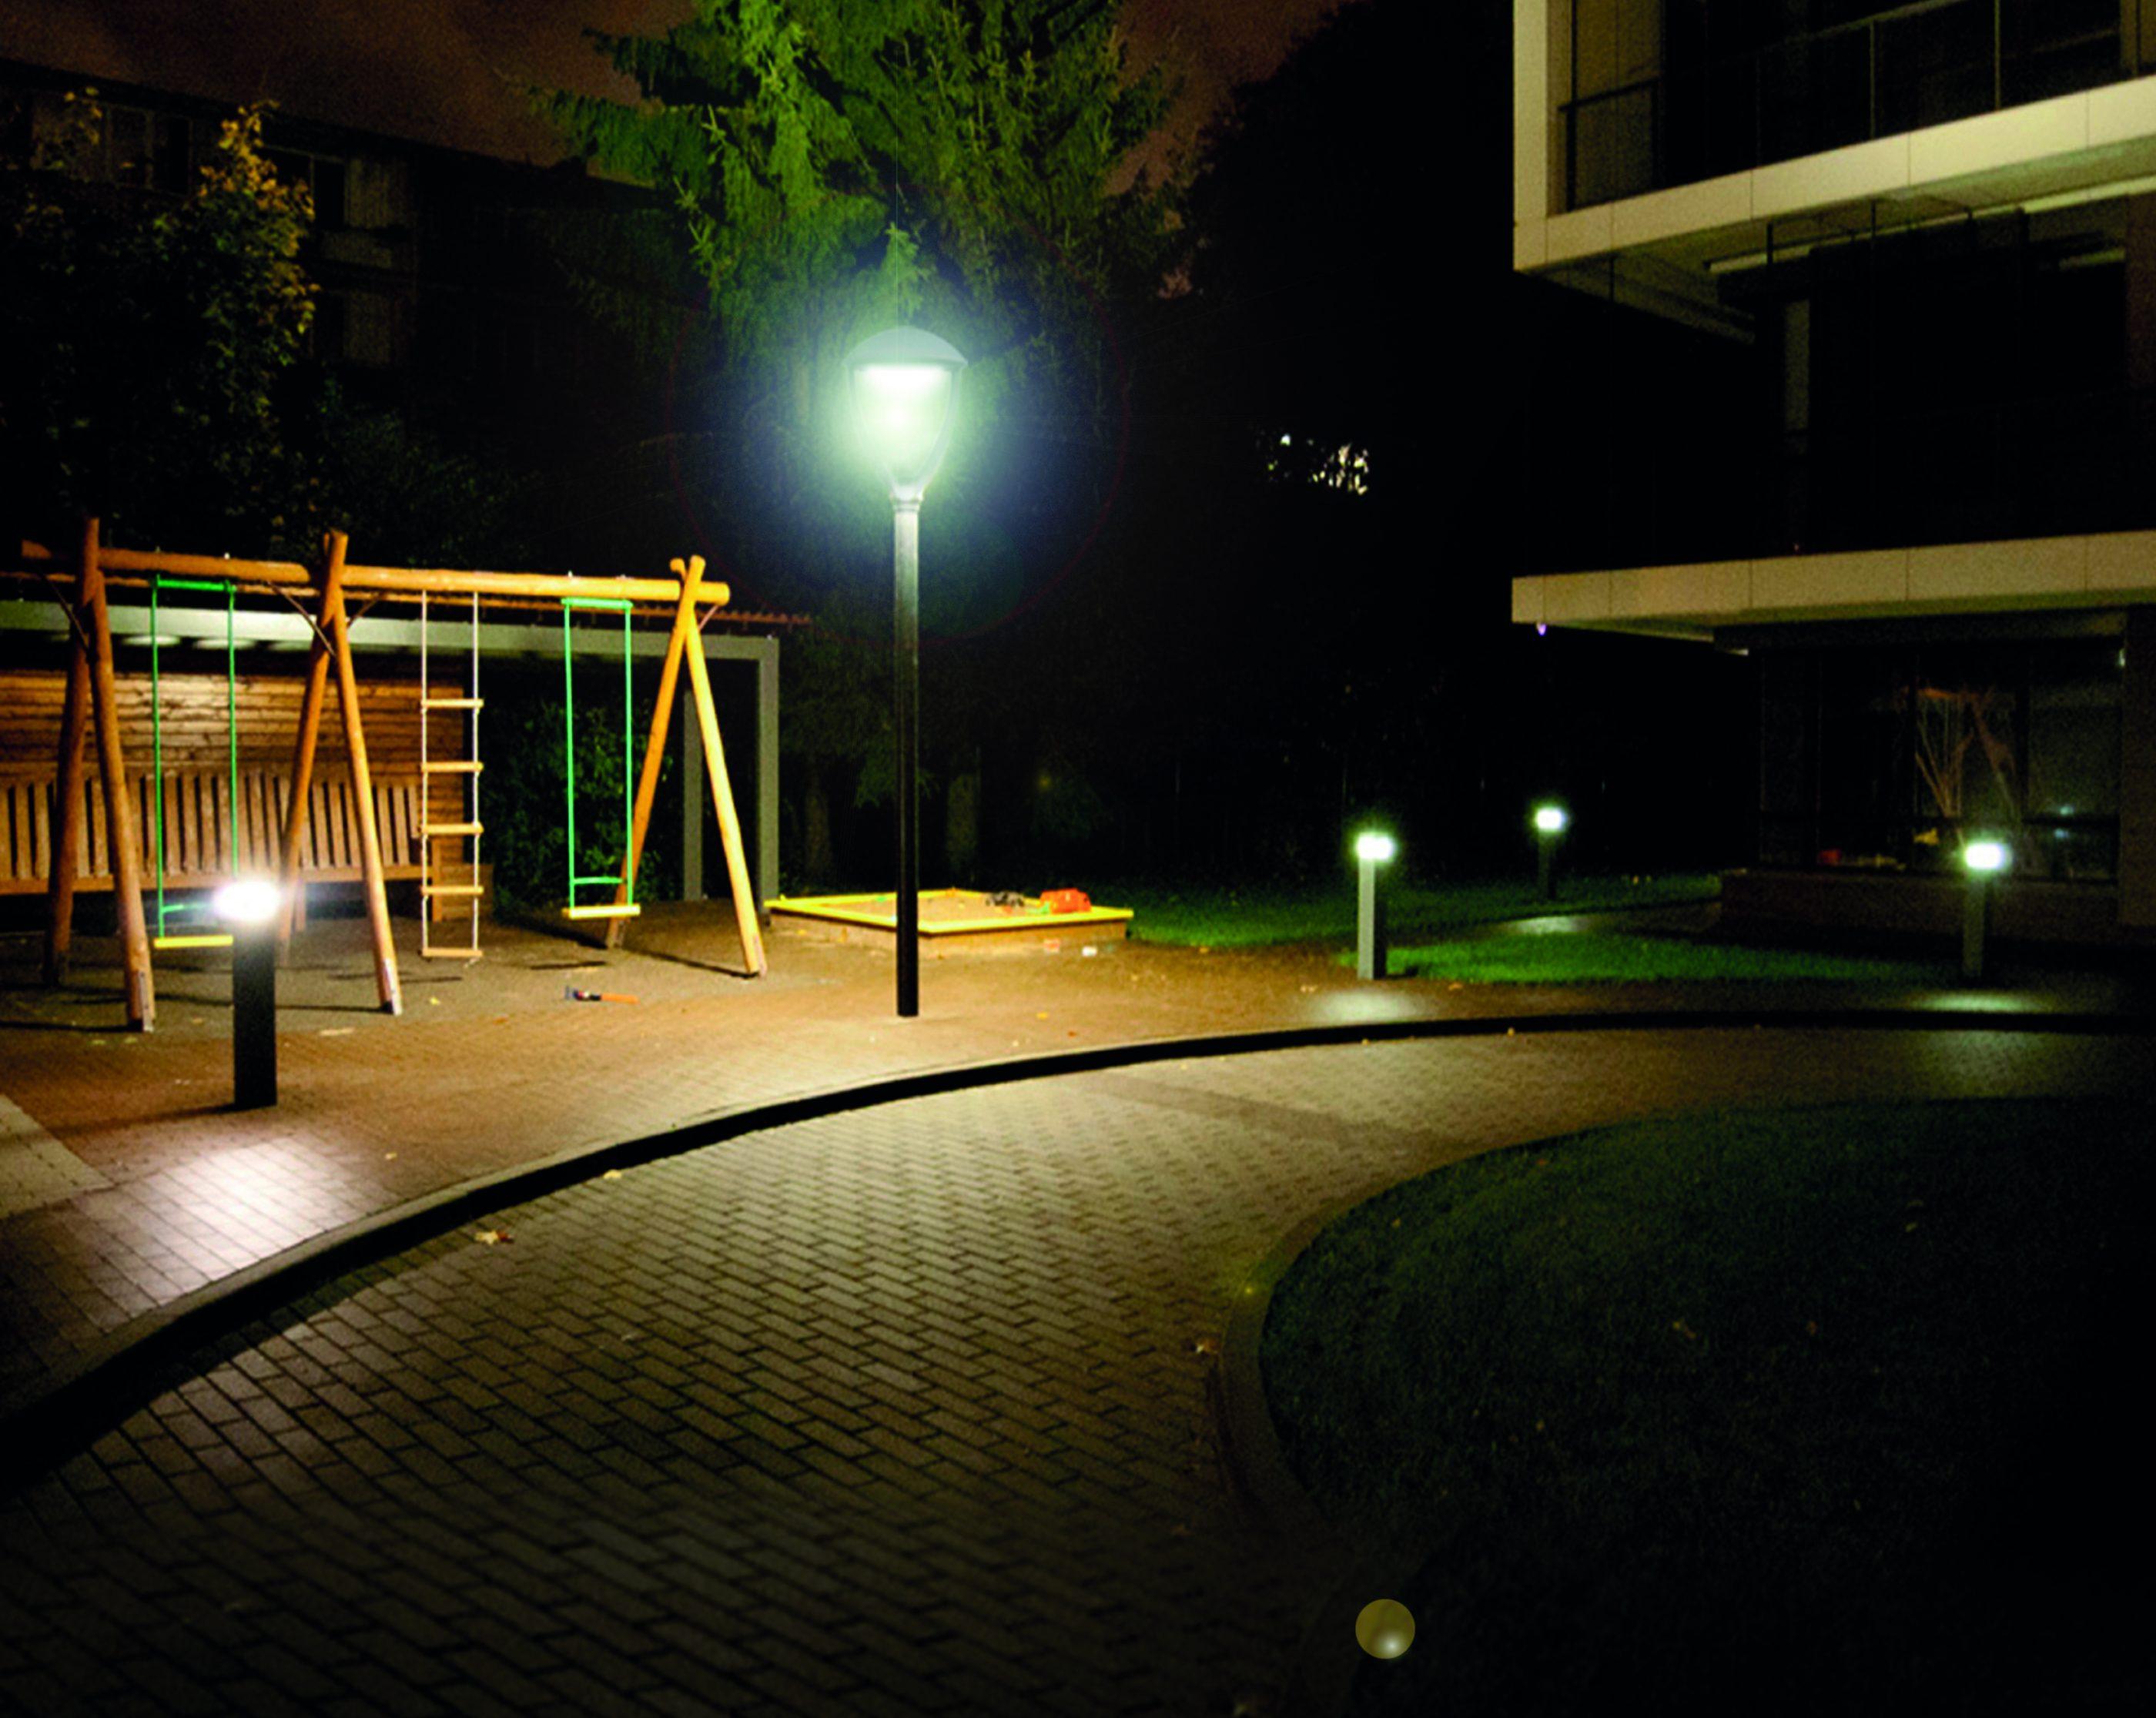 Luminaria de parques y plazas led 90w iluminaci n para for Luminarias de exterior led